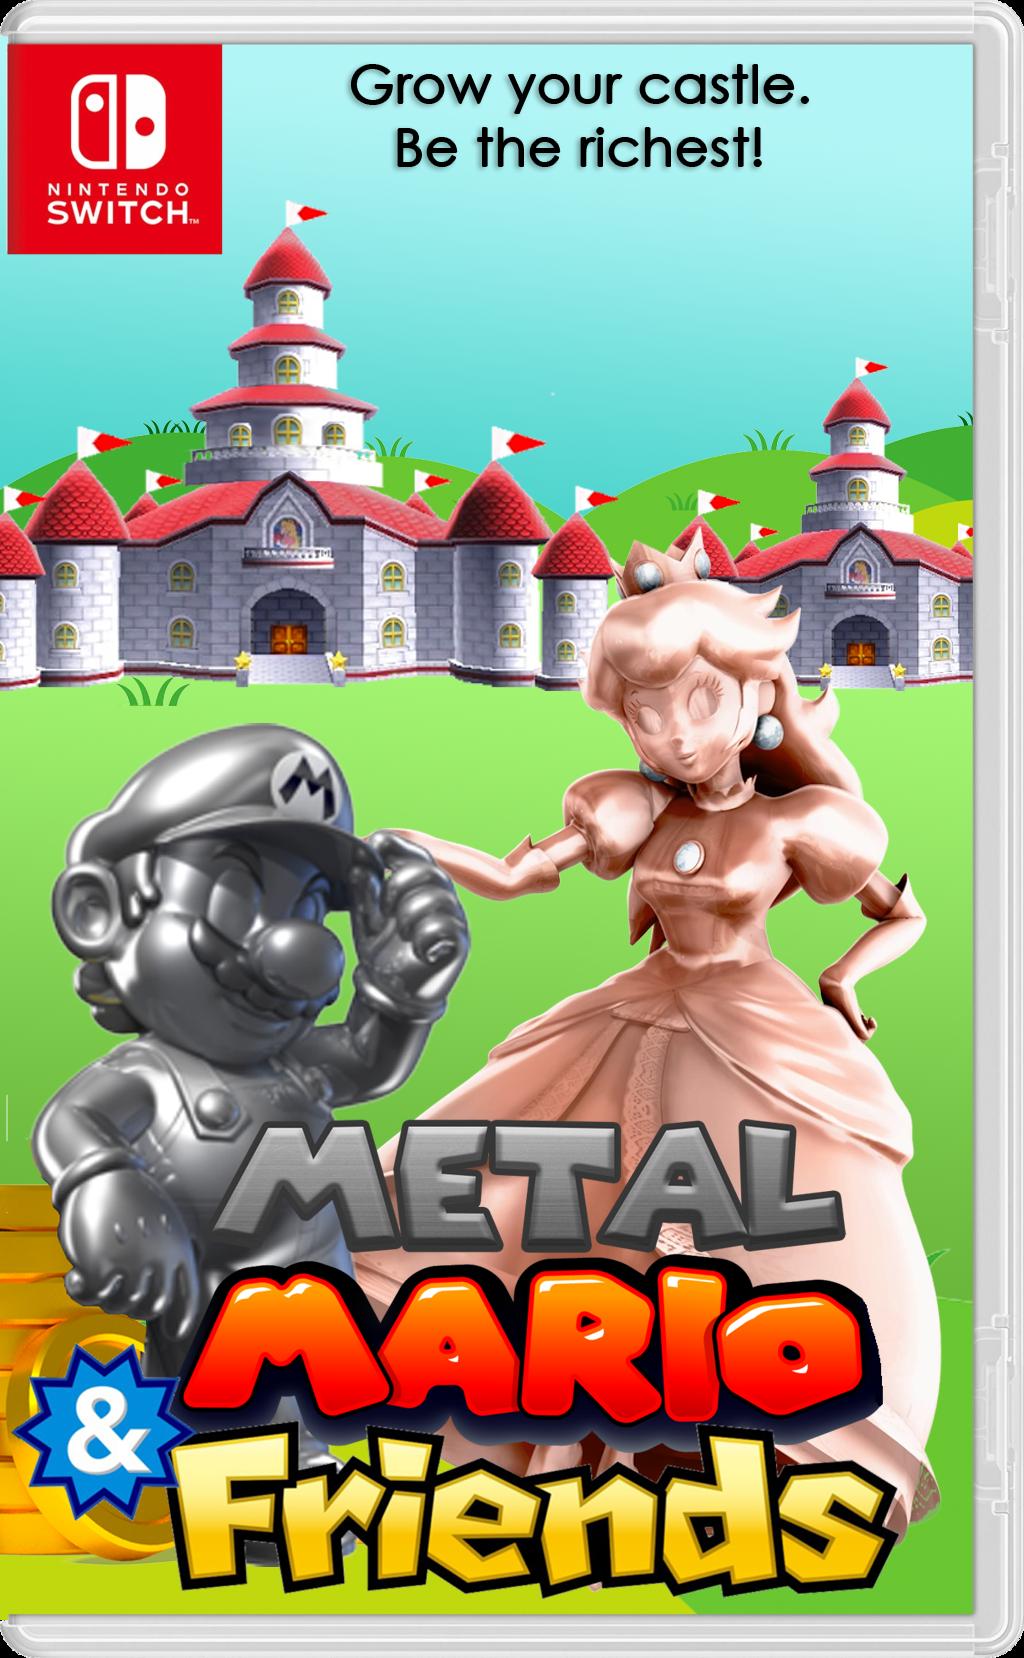 Metal Mario & Friends